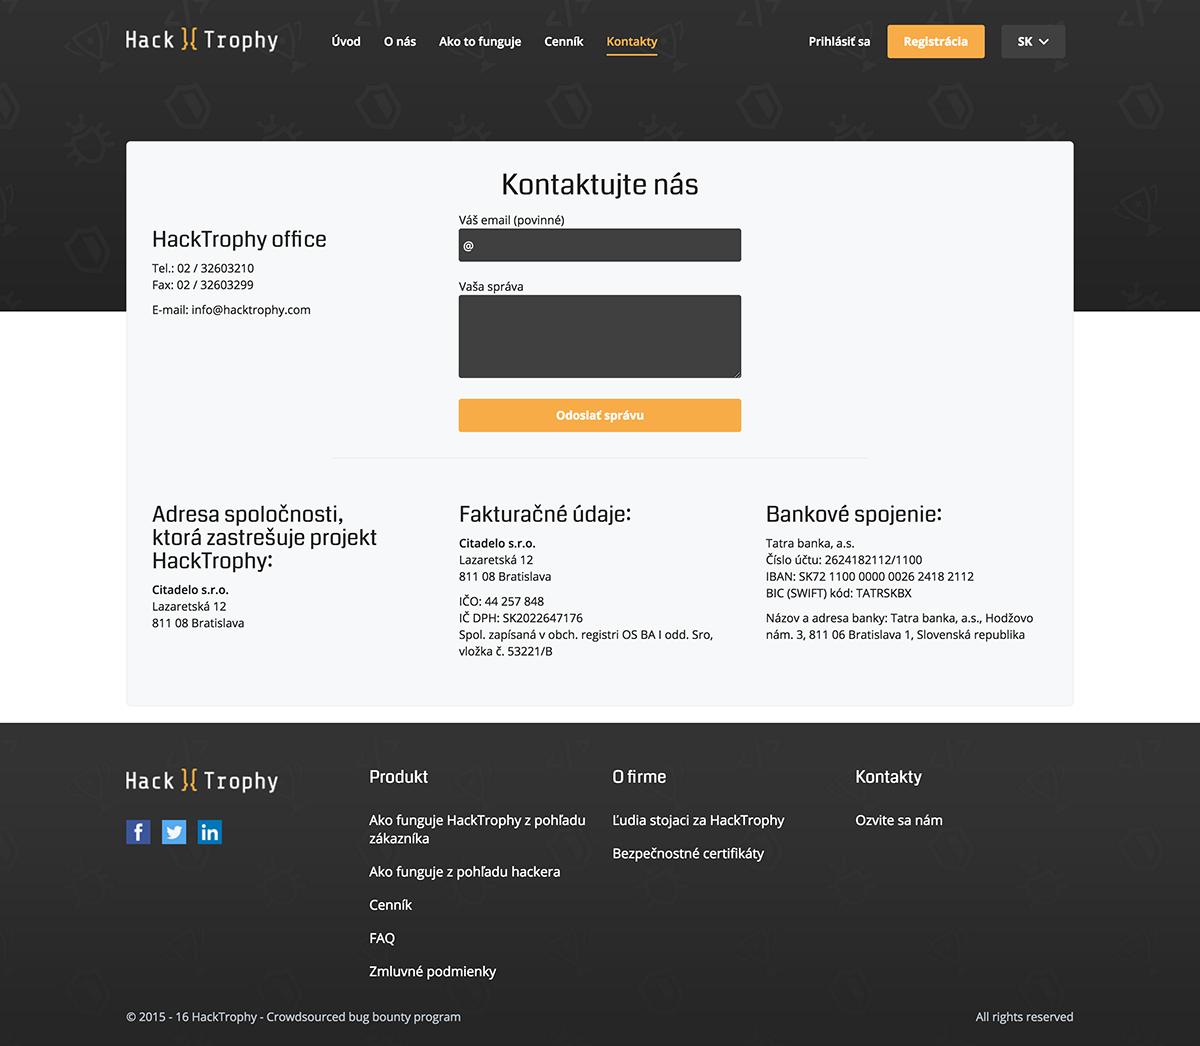 Kontaktujte nás Hacktrophy.com copy